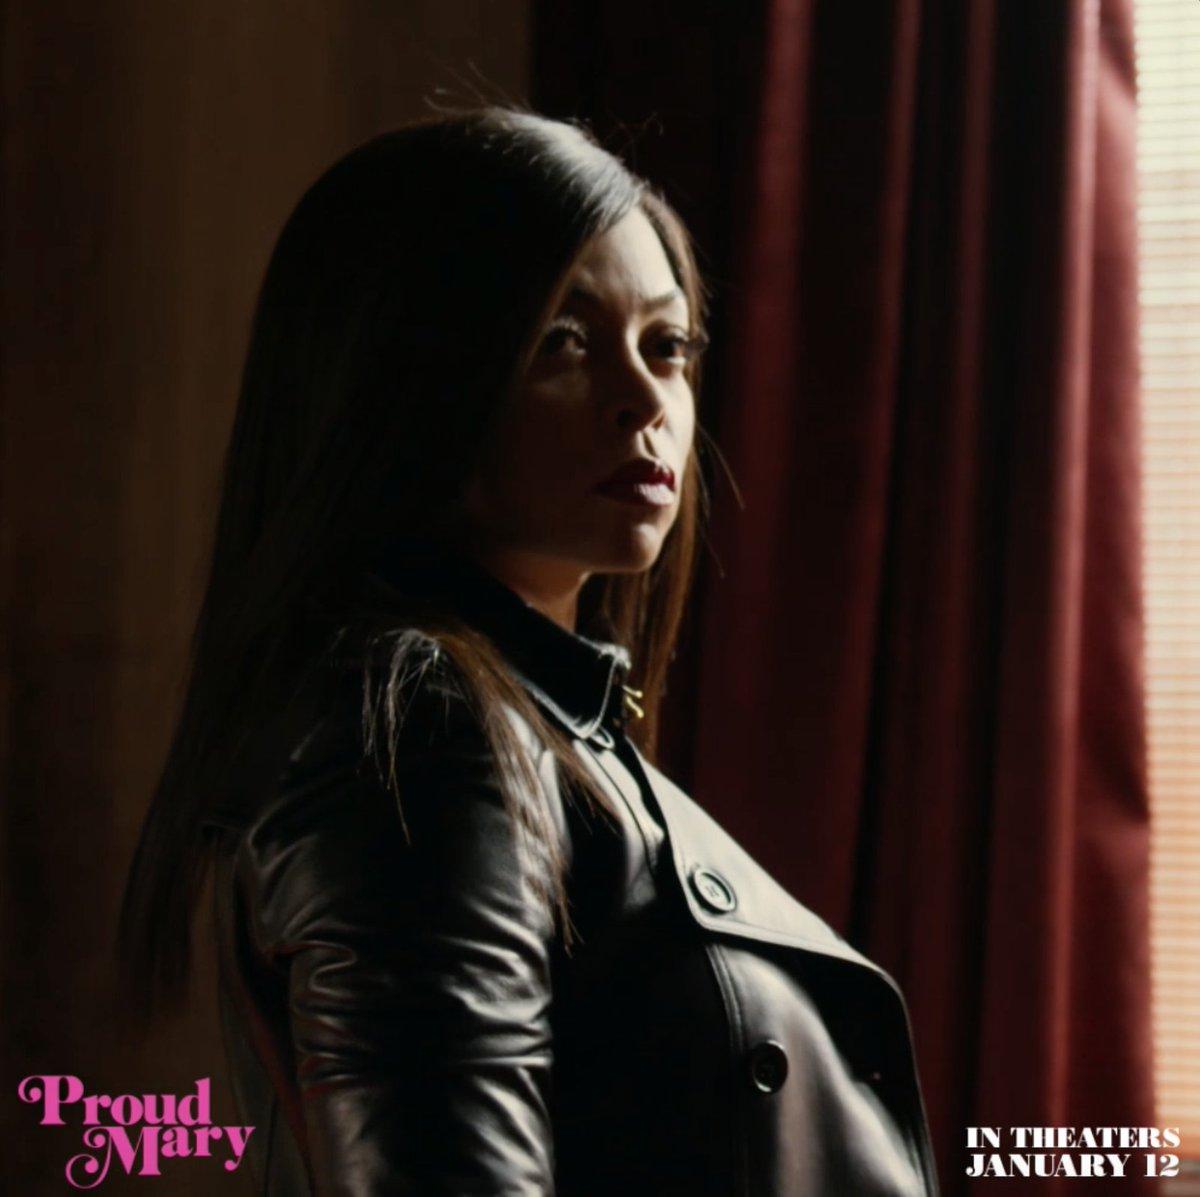 RT @GeeksOfColor: 'Proud Mary' hits theaters tonight! We gotta support Taraji P Henson! Go see it! #ProudMary https://t.co/jELZAFqB3e